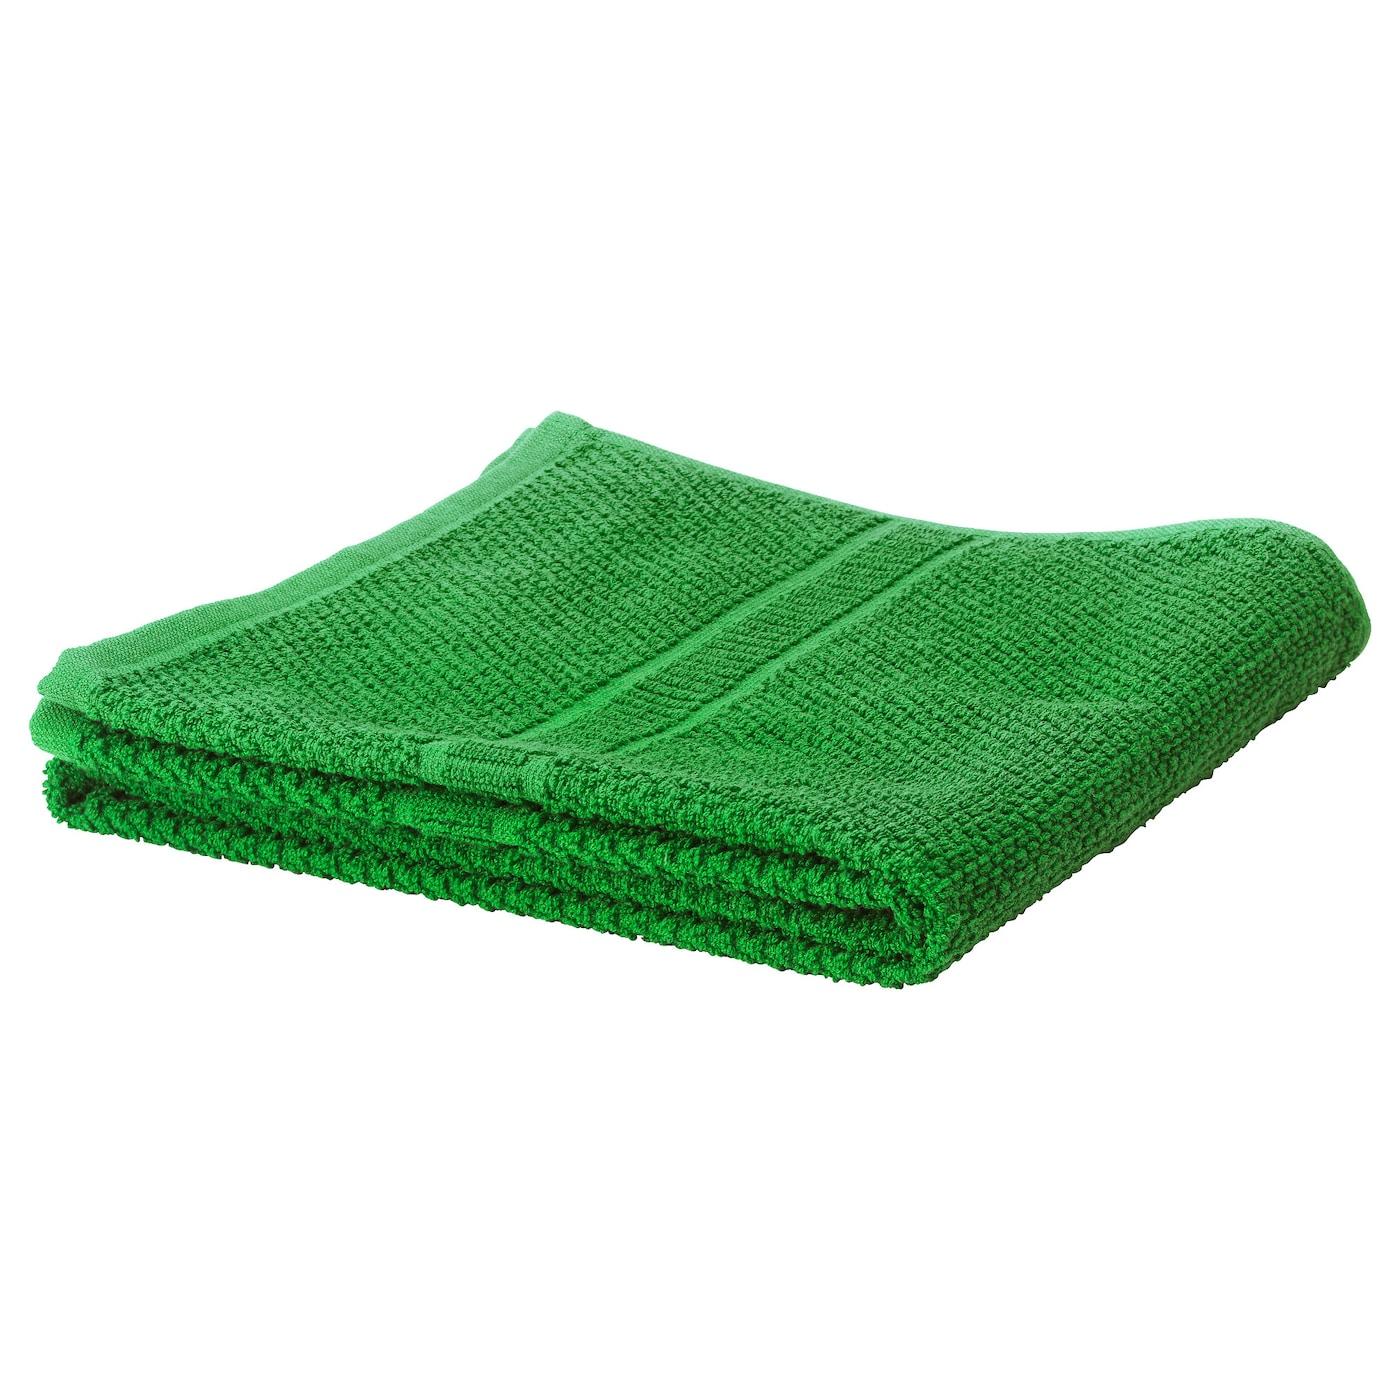 badaren tapis de bain vert 55 cm ikea. Black Bedroom Furniture Sets. Home Design Ideas